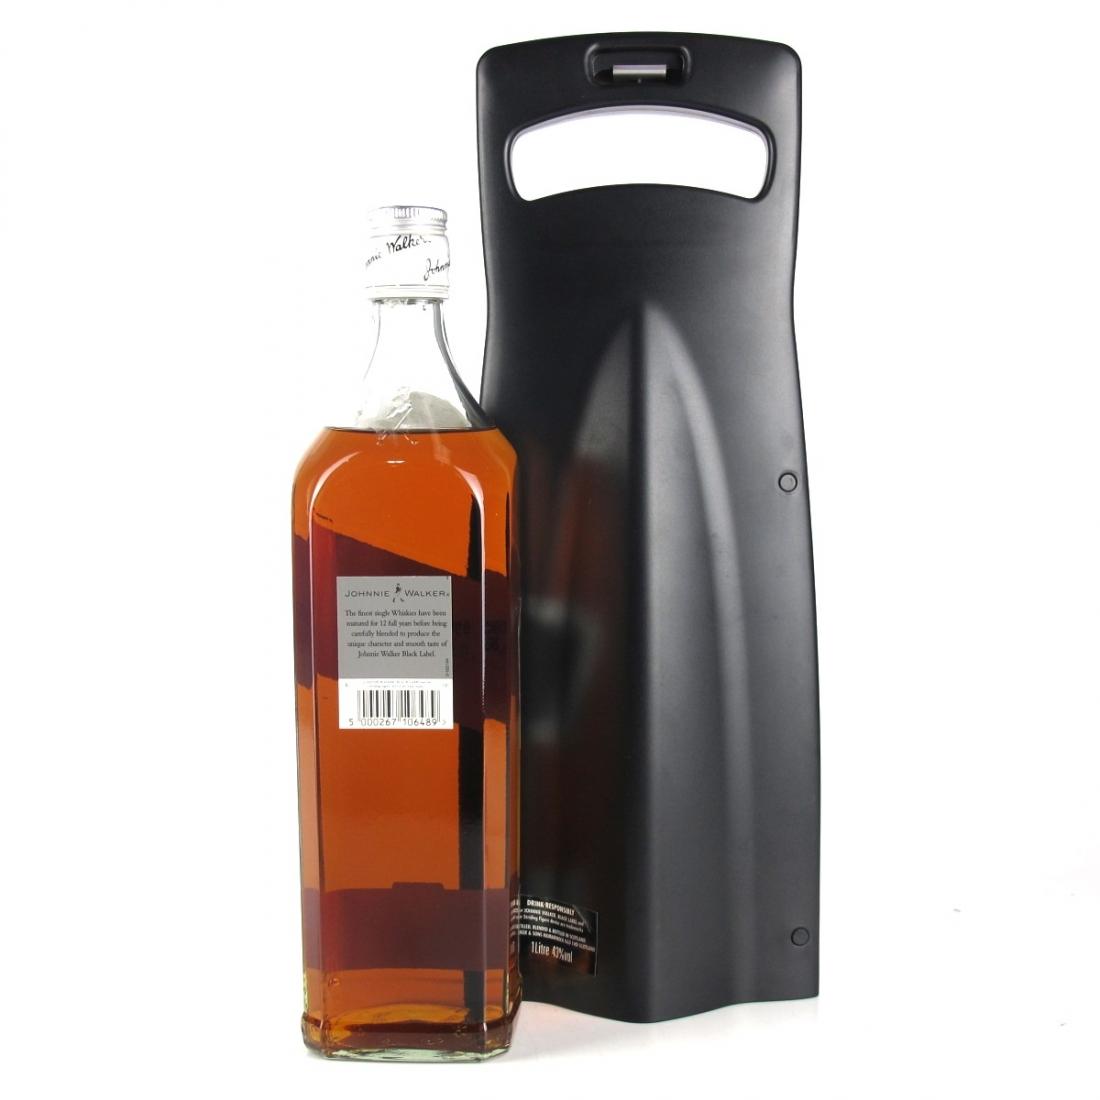 Johnnie Walker Mclaren Limited Edition Black Label 1 Litre